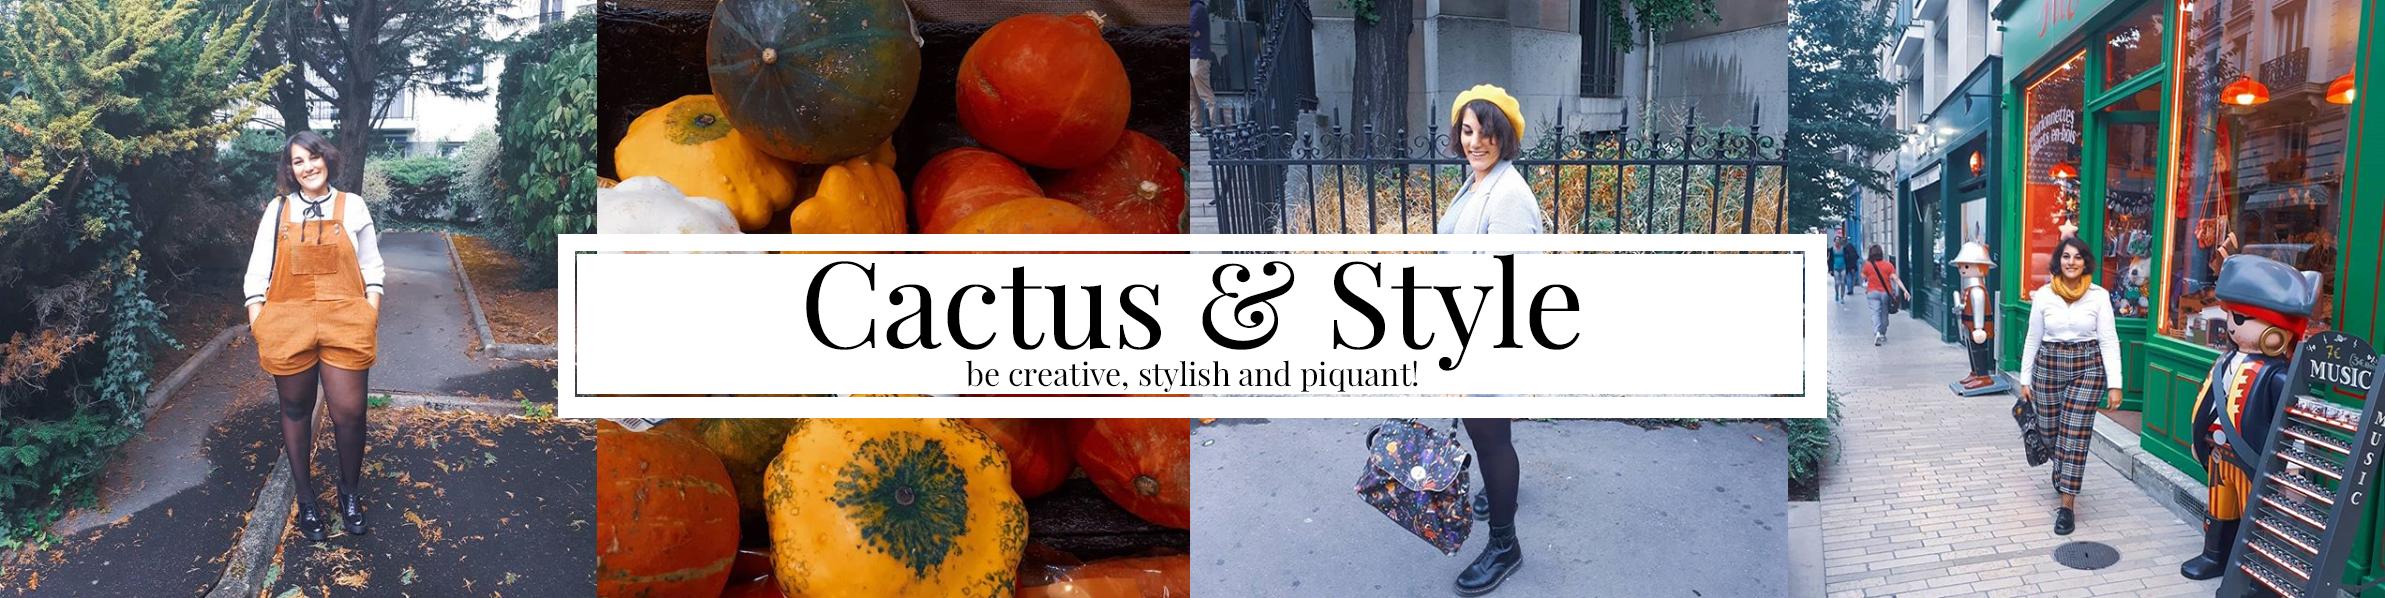 Cactus & Style